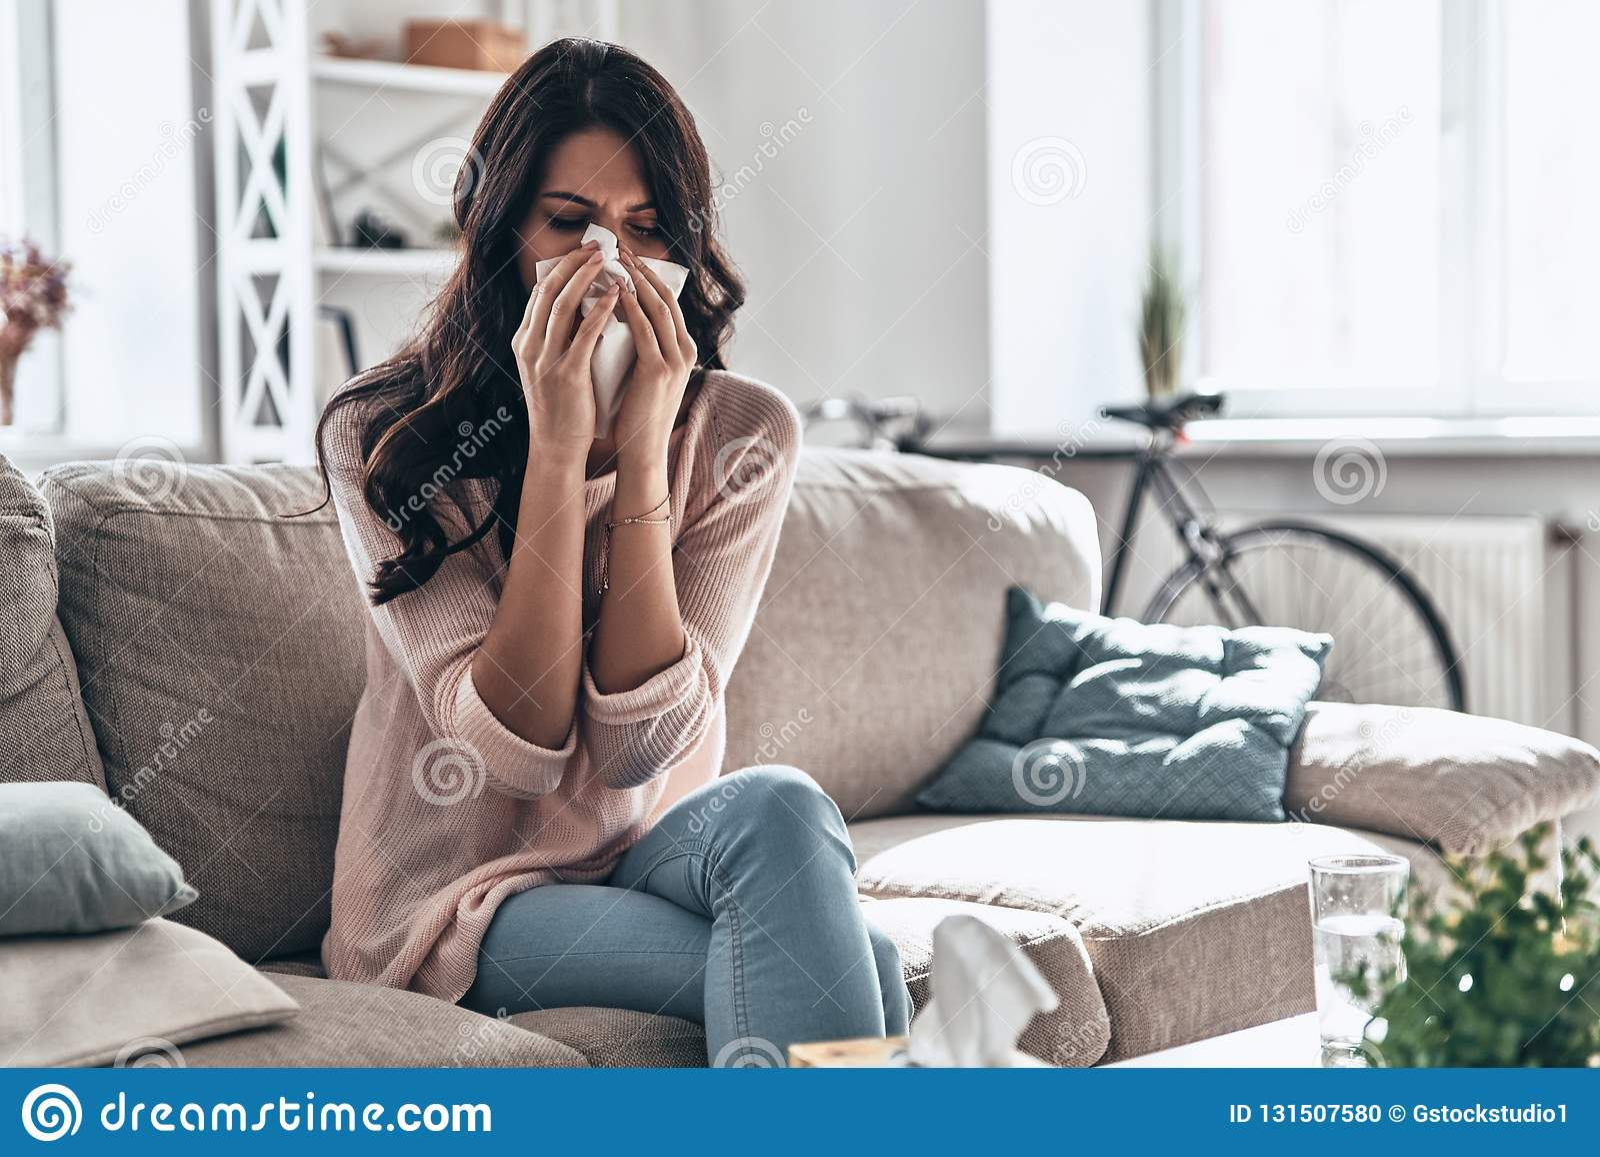 холодный грипп